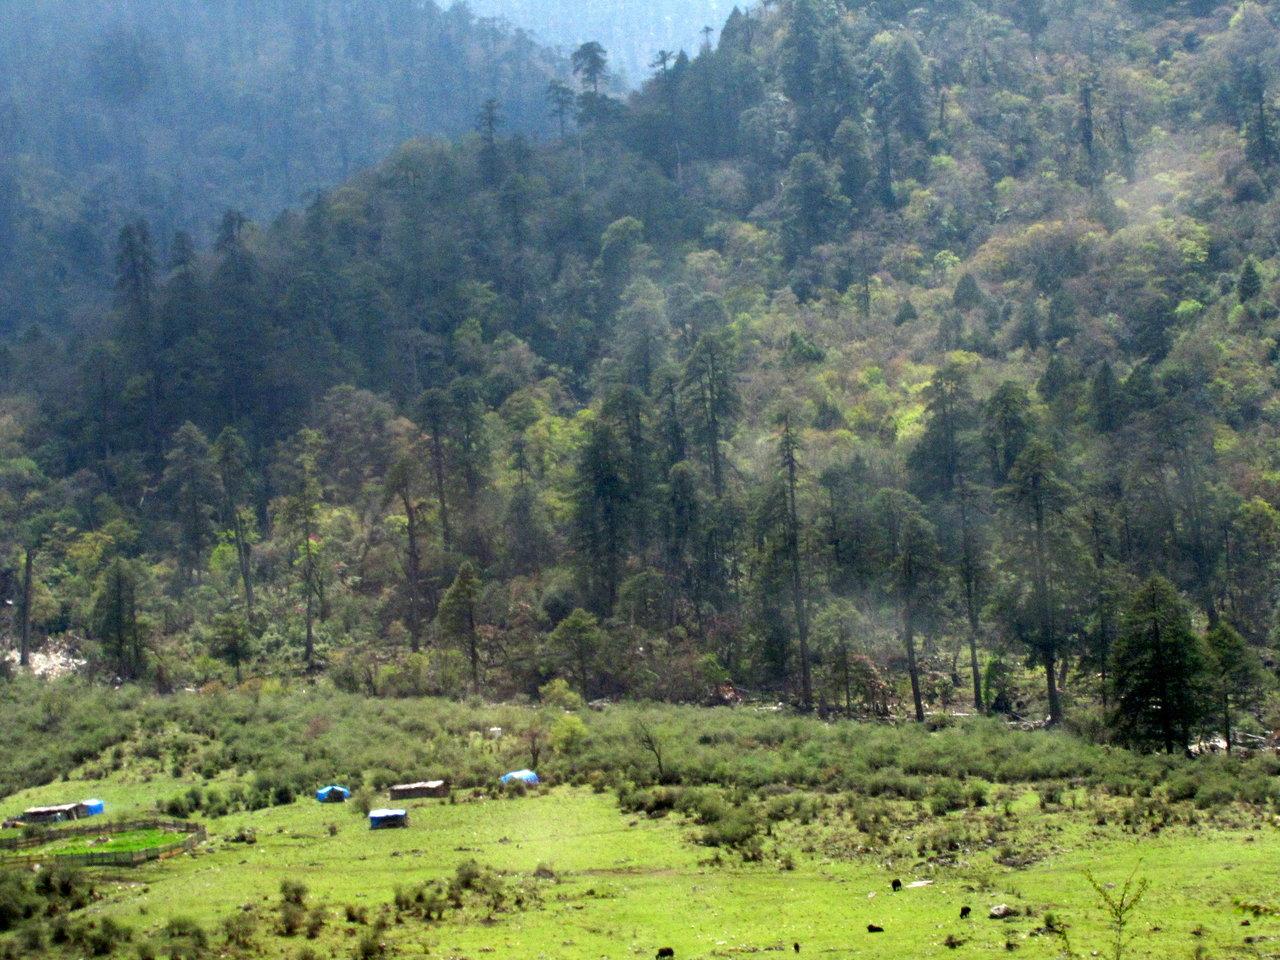 Bhutan Alpine Meadows